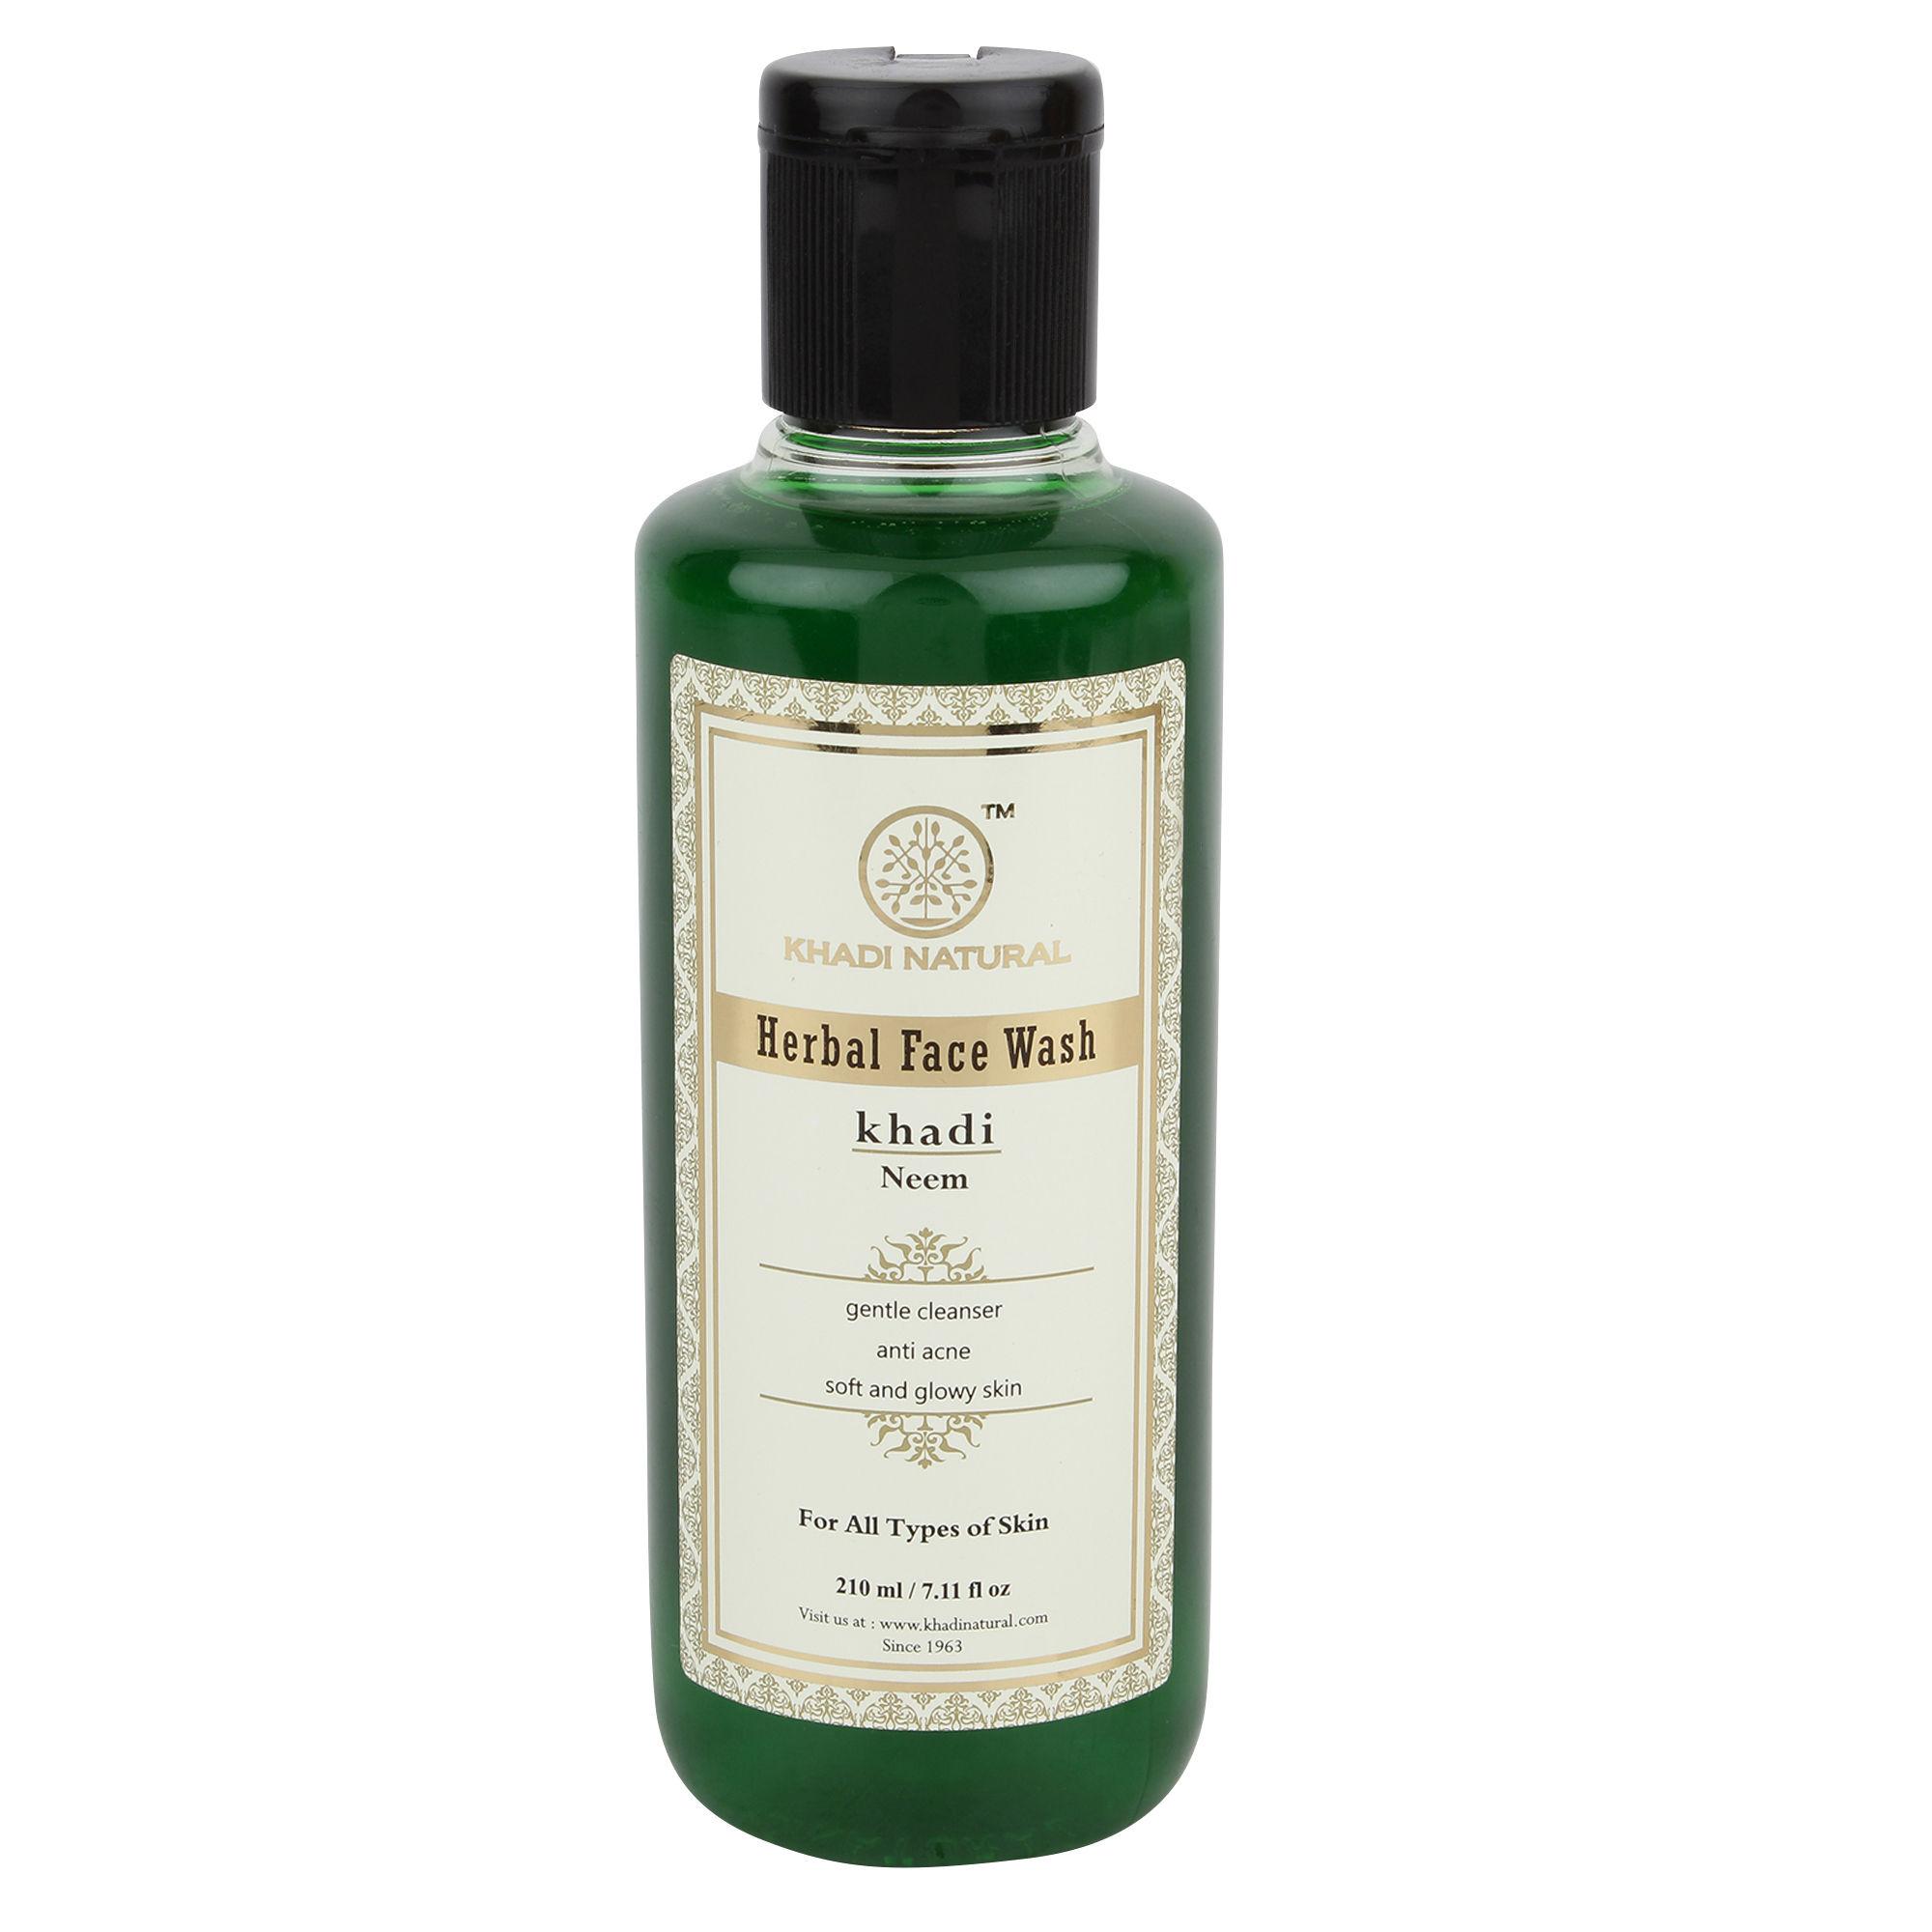 Khadi Herbal Neem Face Wash, 210 ml